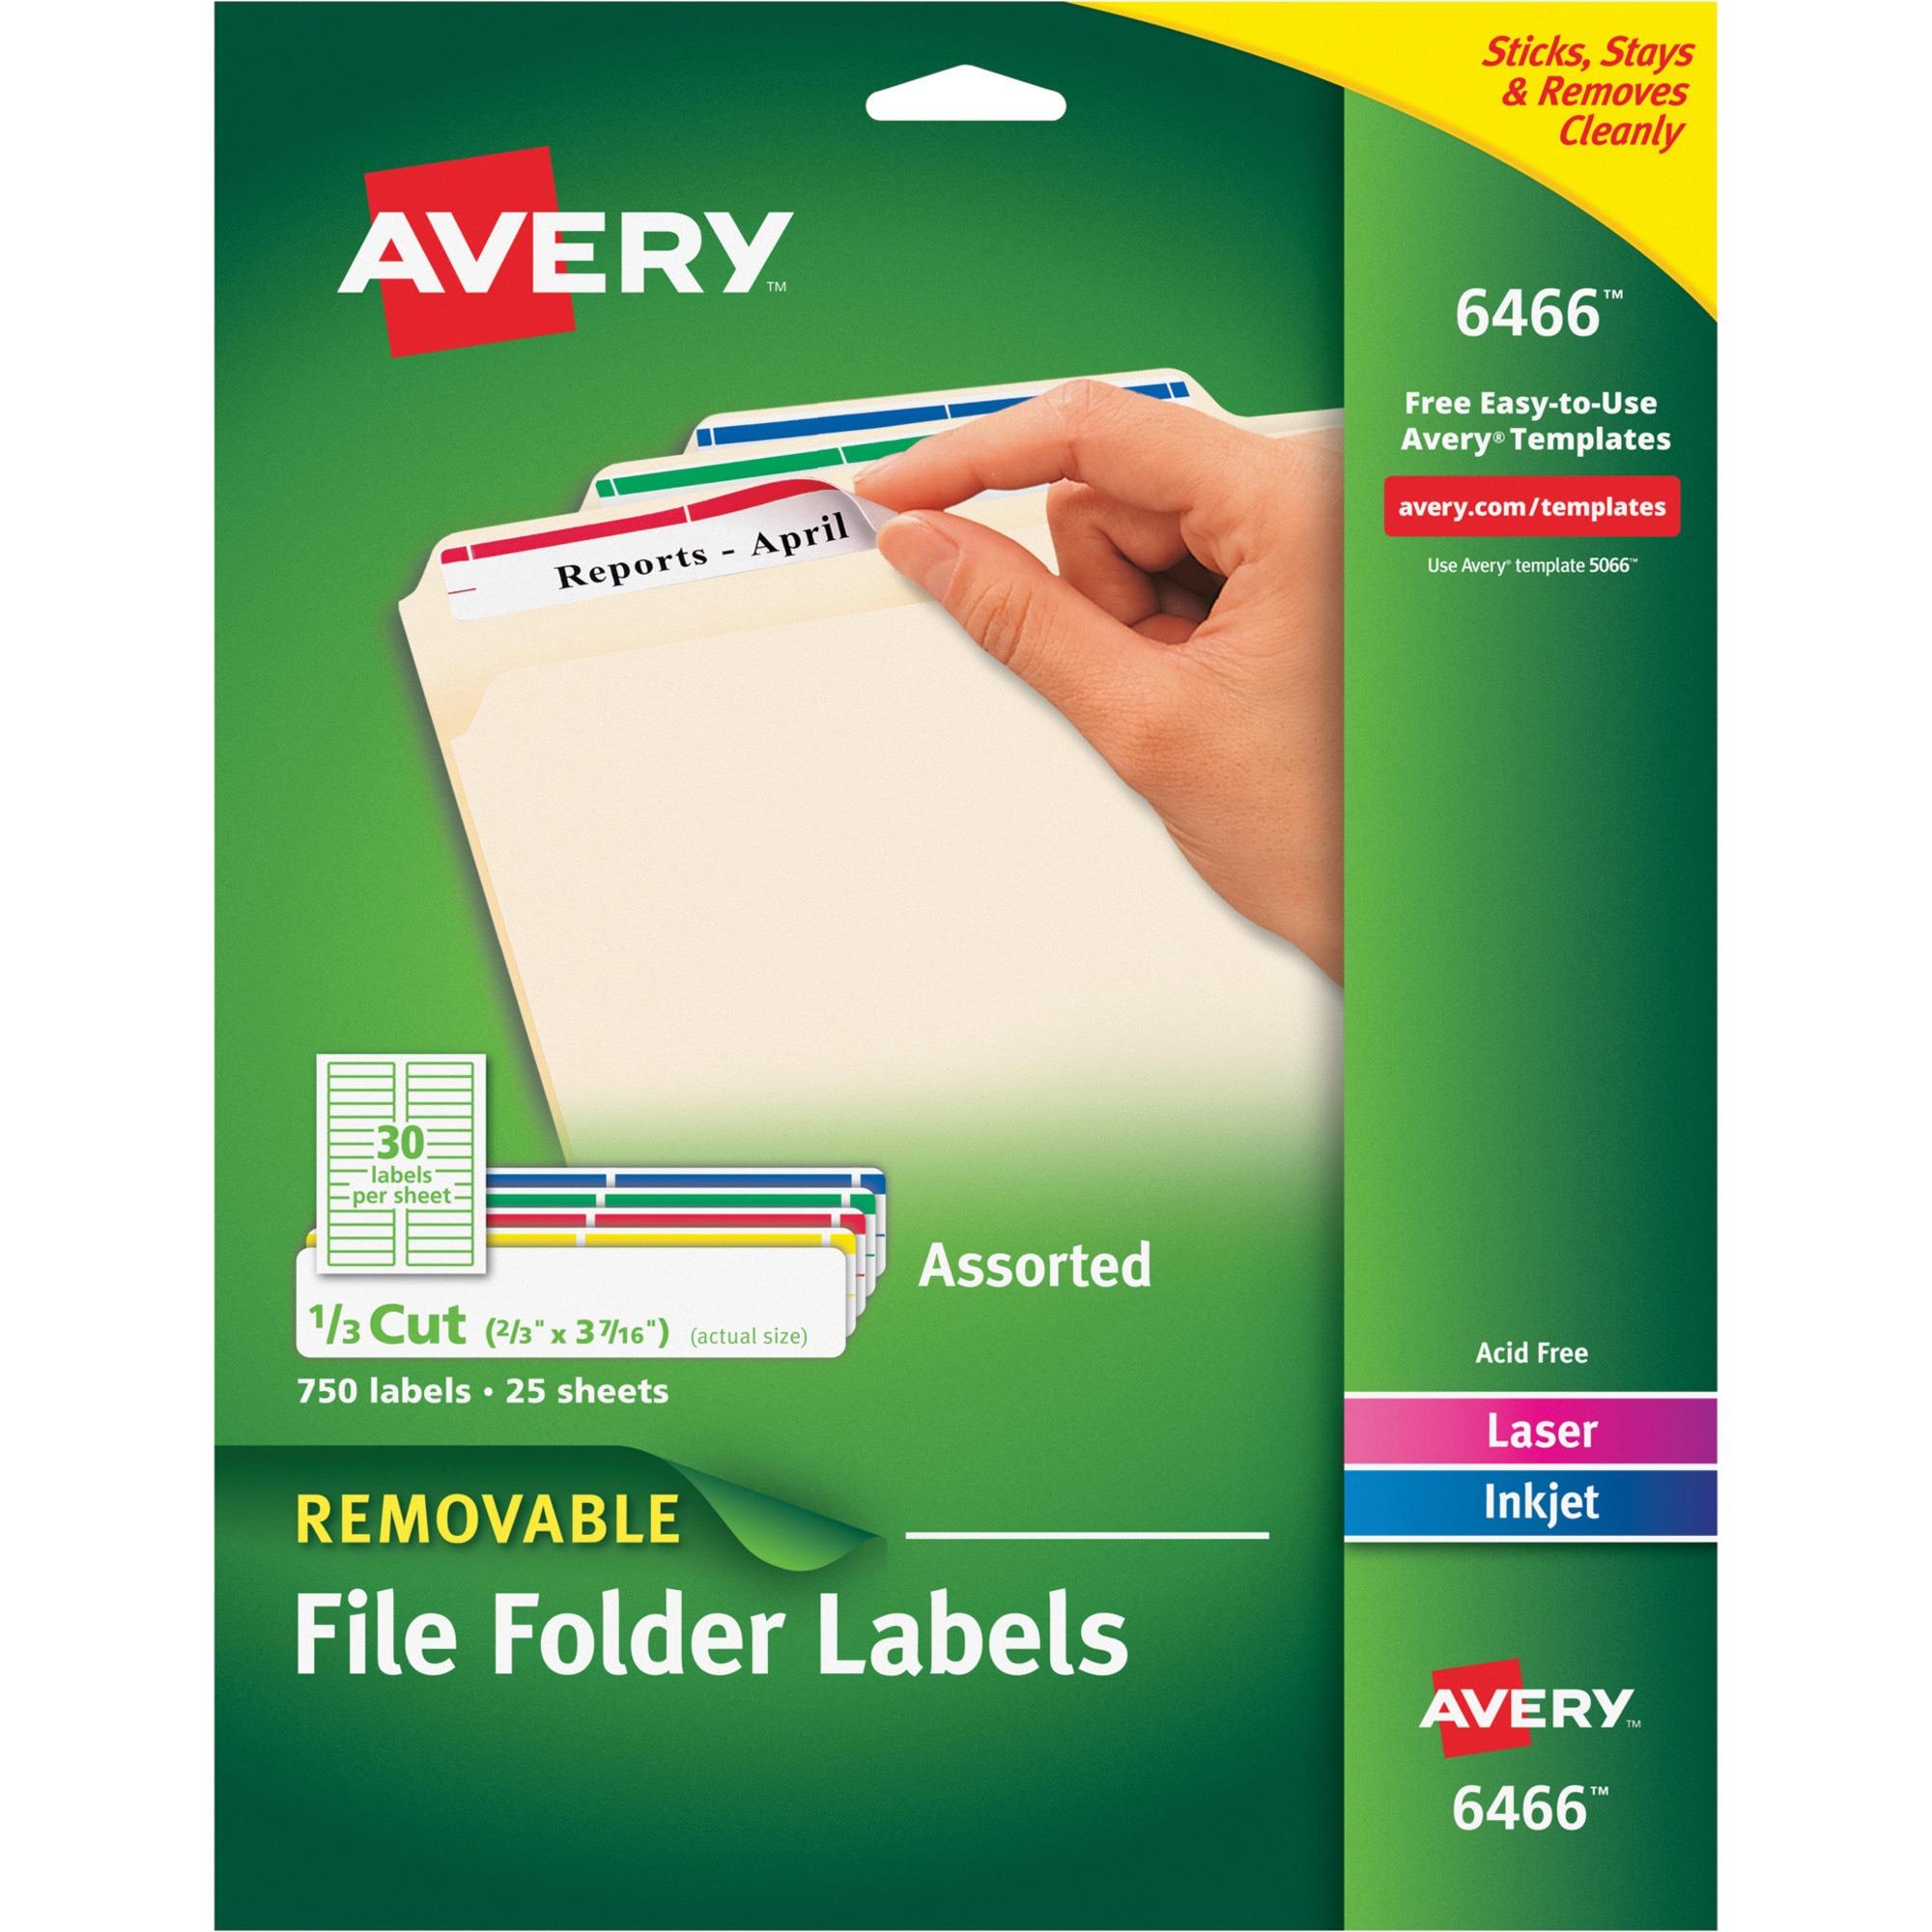 Avery Removable 1/3-Cut File Folder Labels, Inkjet/Laser, .66 x 3.44, WE/ASST, 750/PK